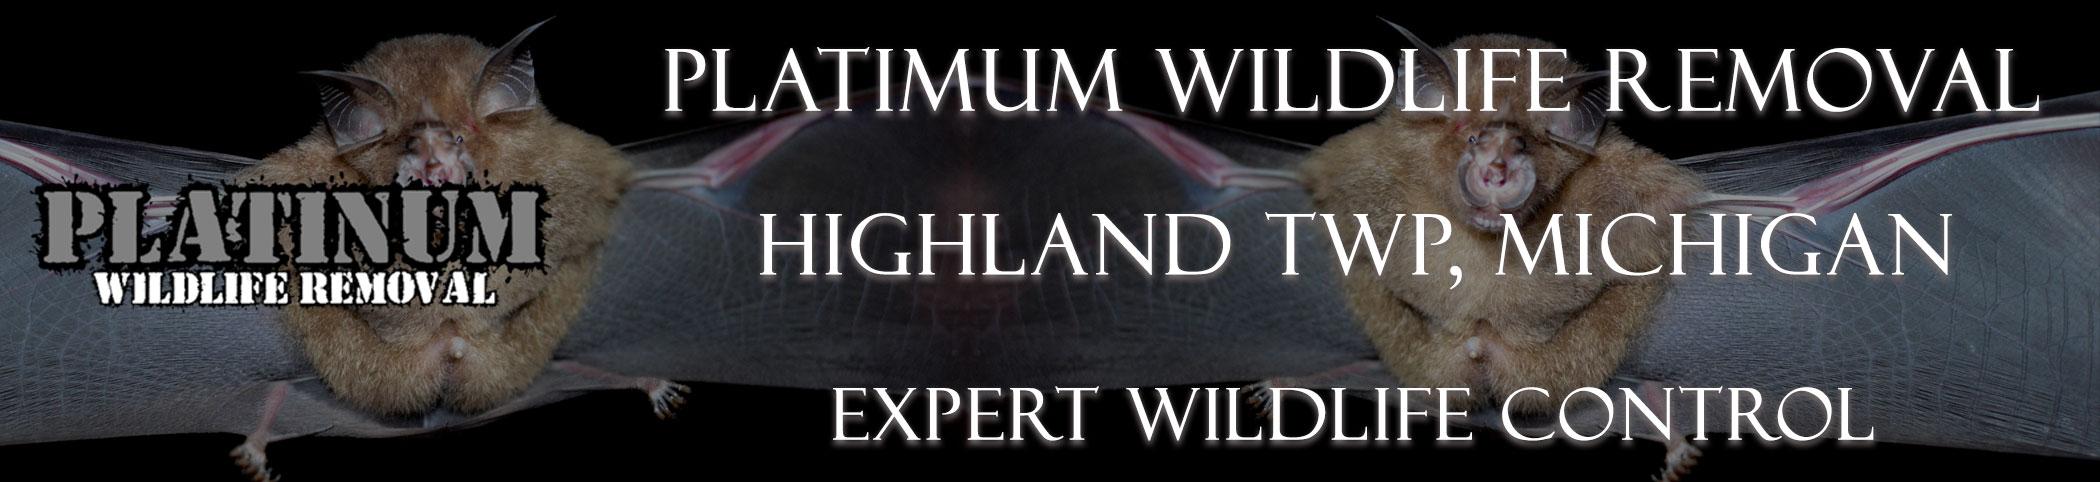 Highland-TWP-Platinum-Wildlife-Removal-michgan